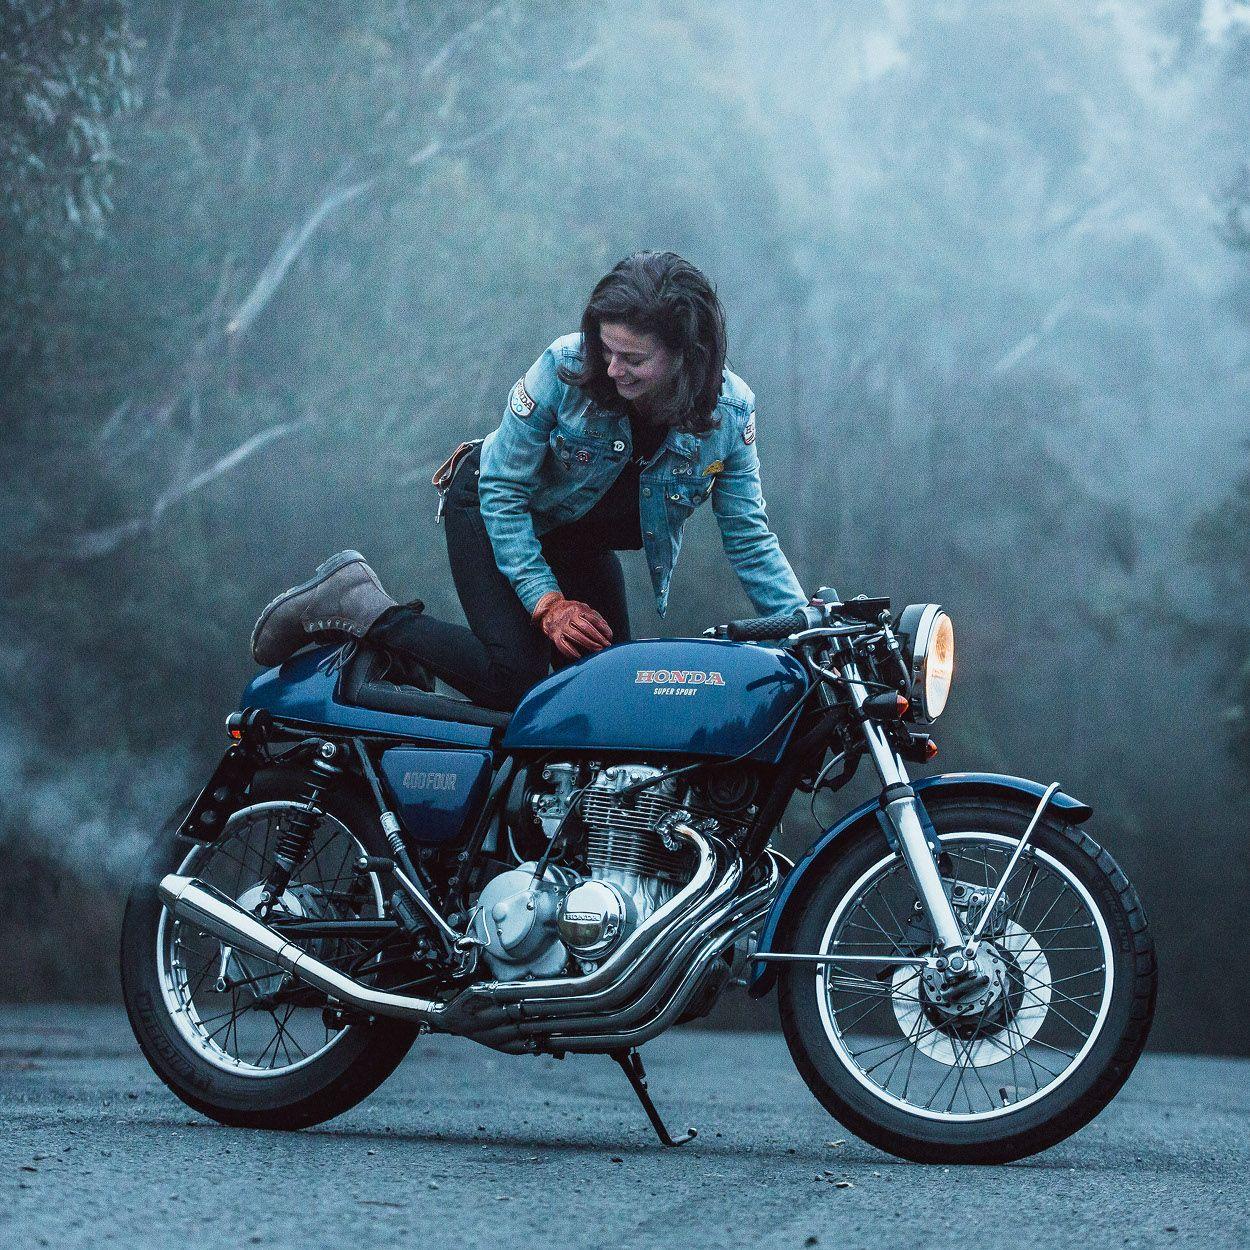 Katie Abdilla S Honda Cb400f Restomod Billie Classic Motorcycles Motorcycle Helmets Vintage Cafe Racer Girl